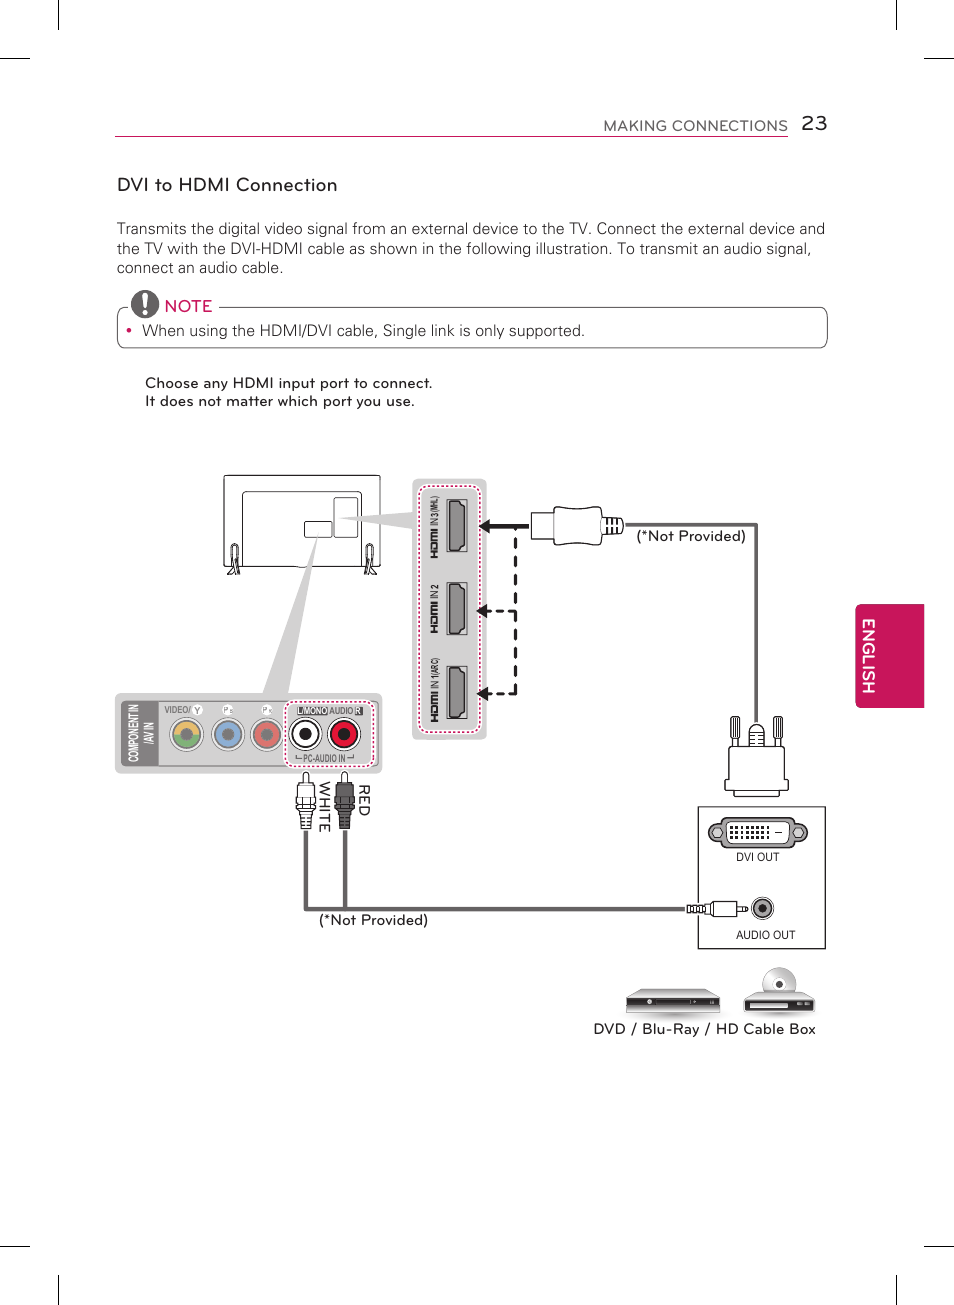 Dvi To Hdmi Connection English Lg 55lb6500 User Manual Page 23 Diagram 40